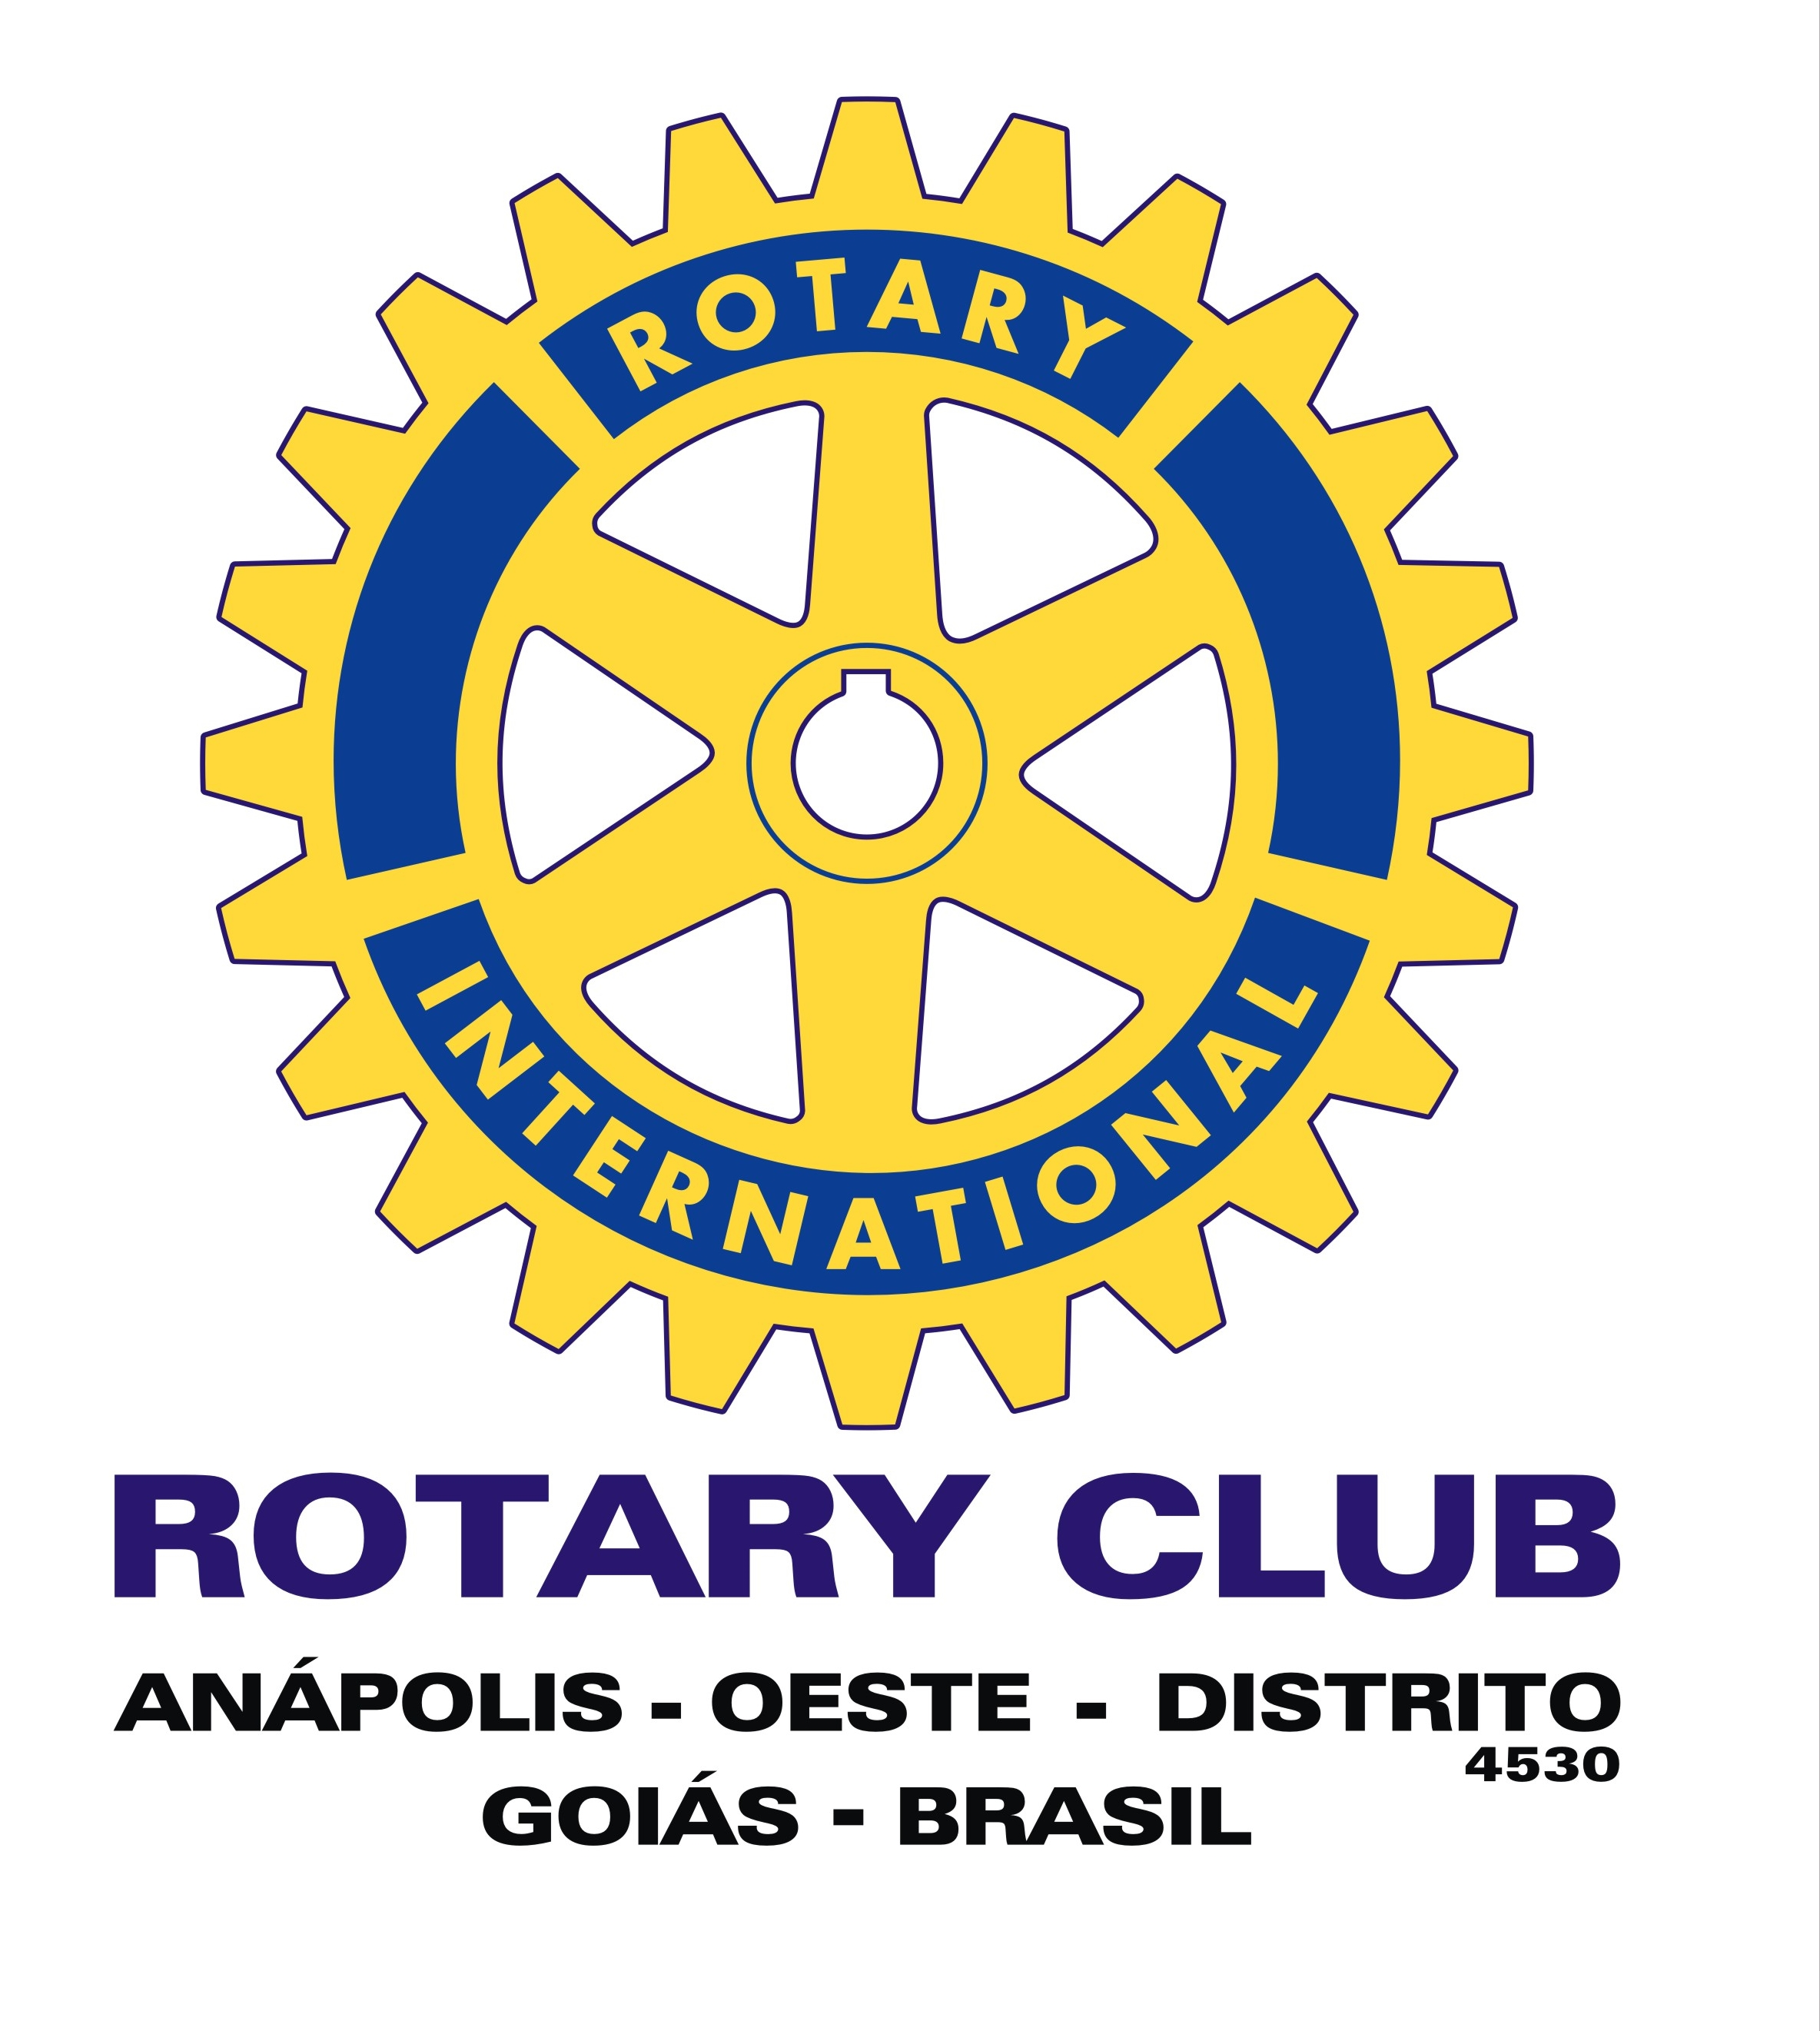 rotary+jpg.jpg